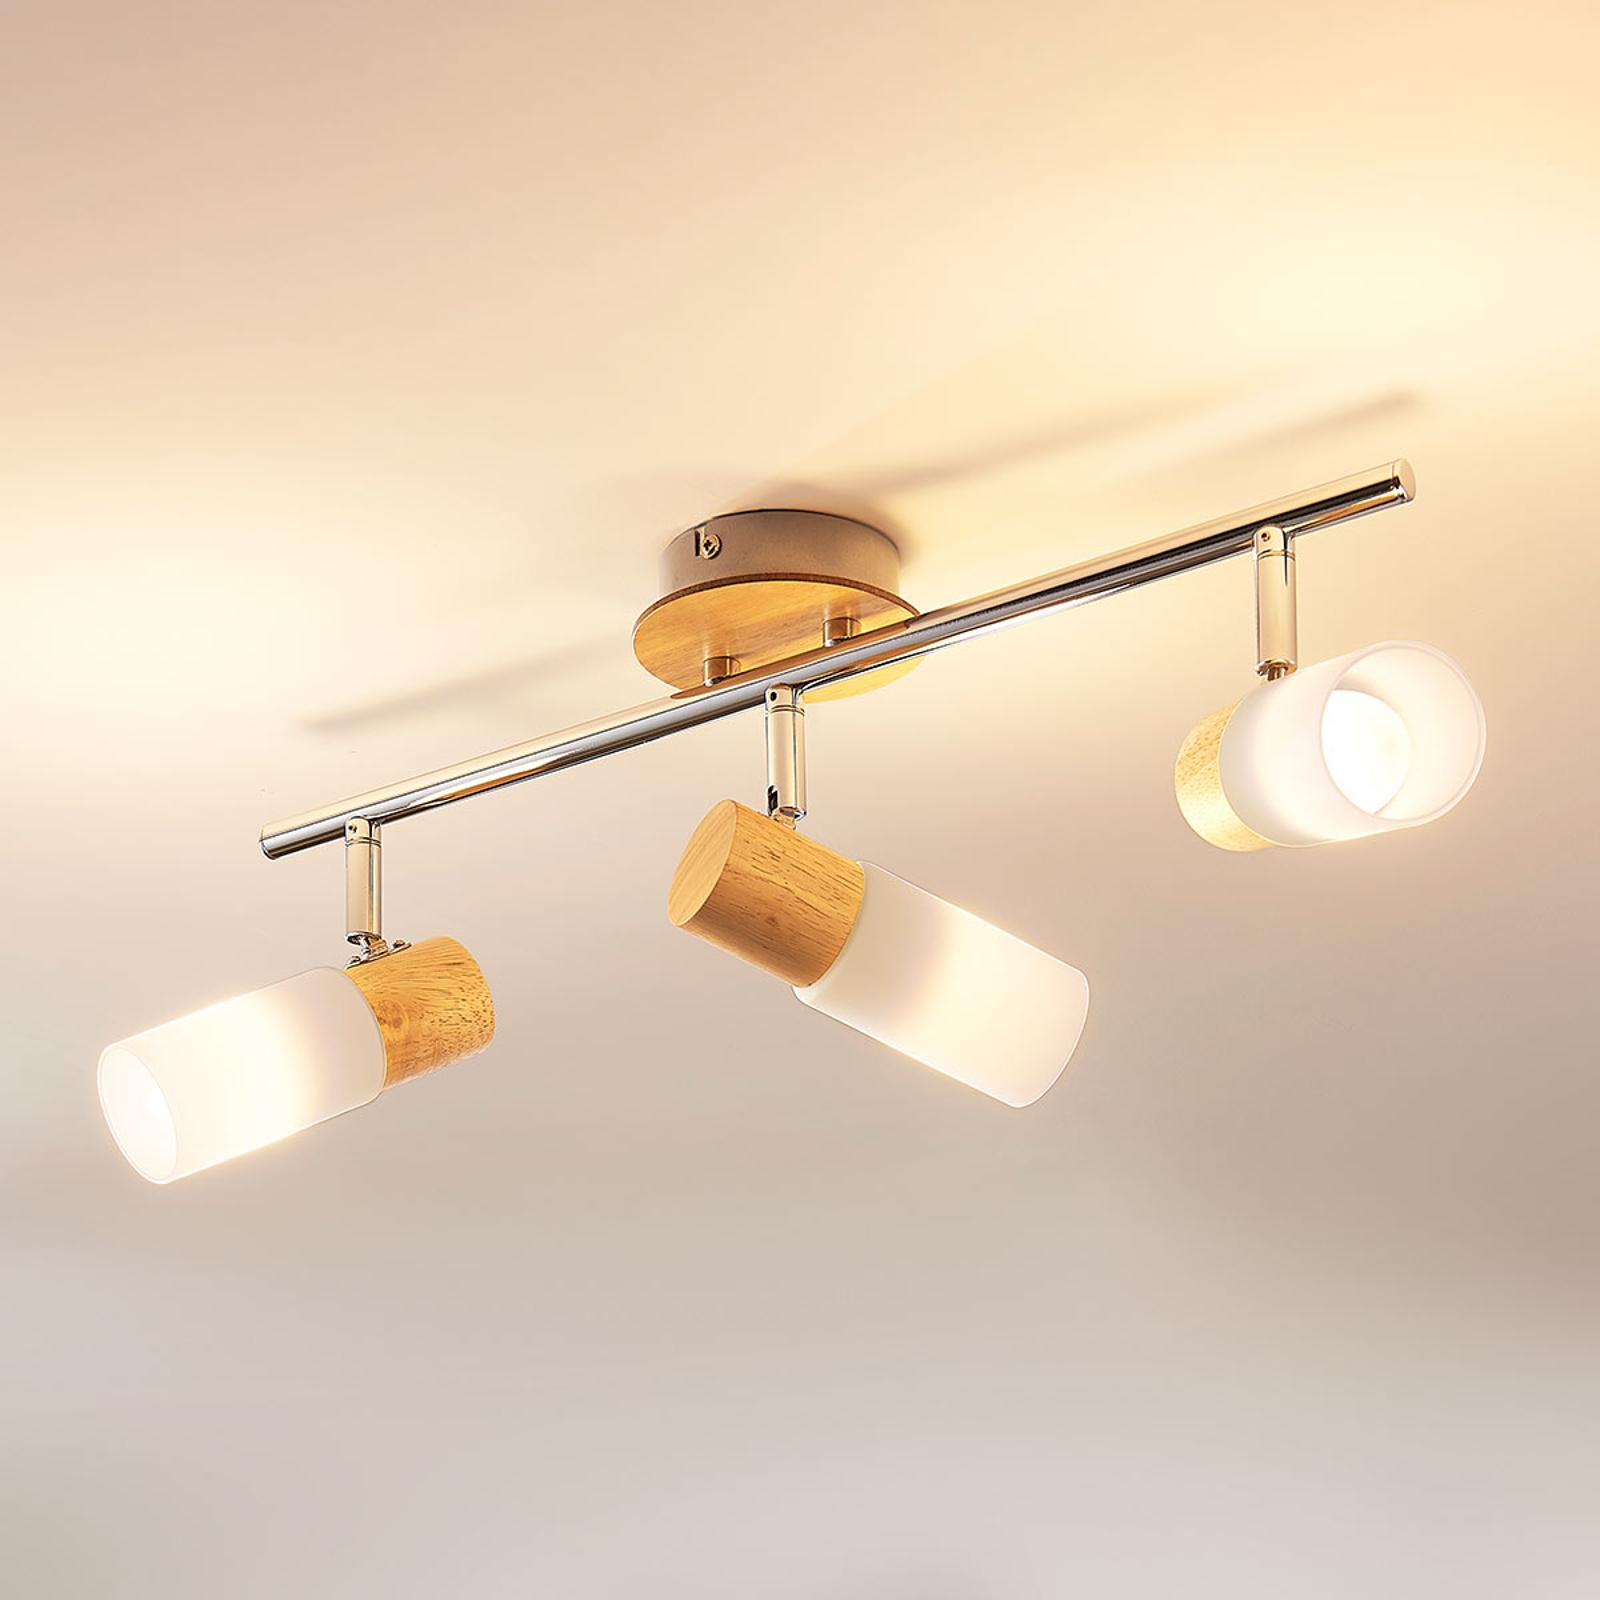 Christoph - LED plafondlamp met hout en 3 lampen